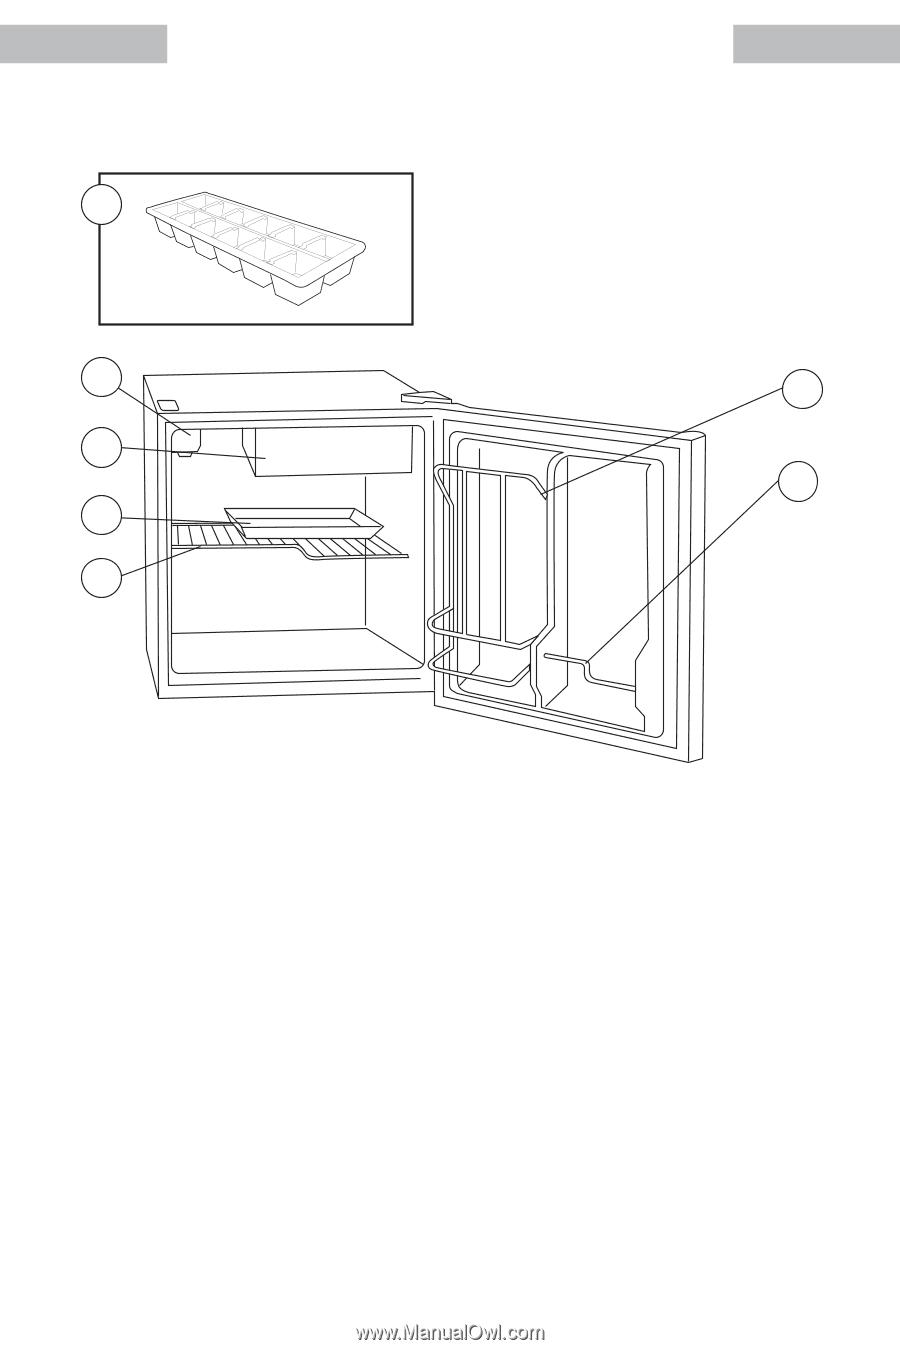 haier hsw02 manual browse manual guides u2022 rh trufflefries co